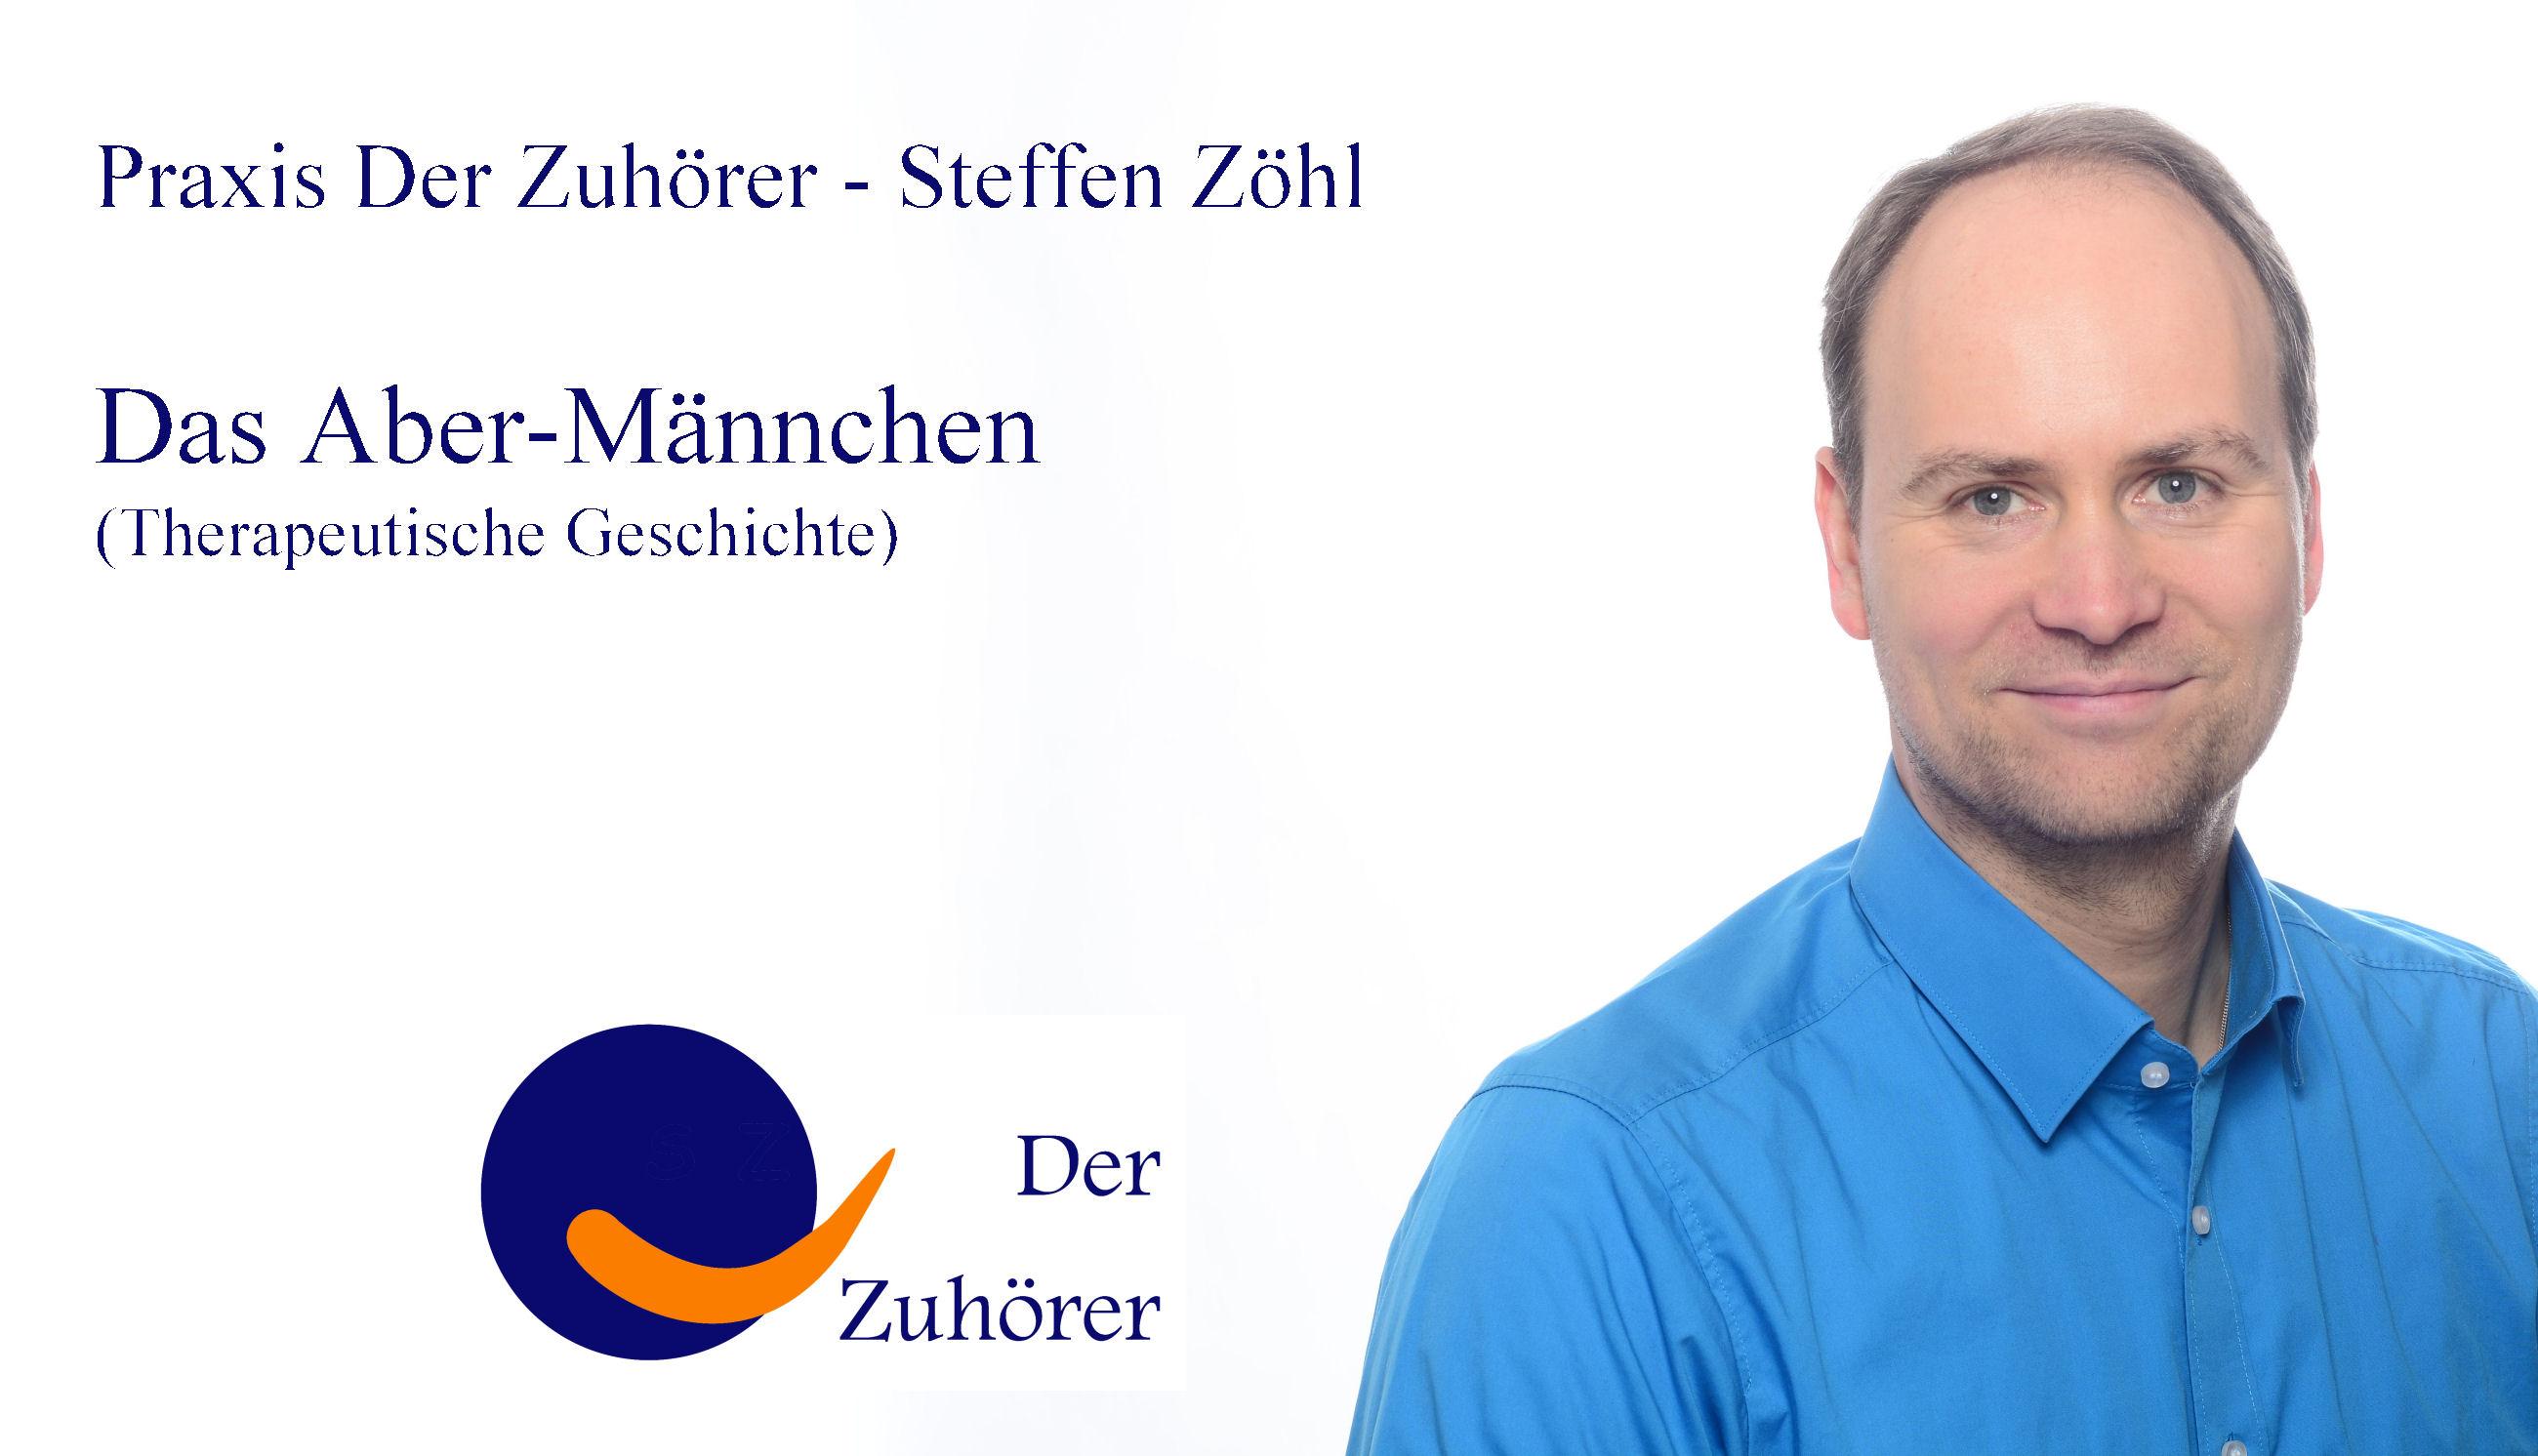 SinnSationsGeschichten Aber-Männchen © Praxis Der Zuhörer - Steffen Zöhl, 2017